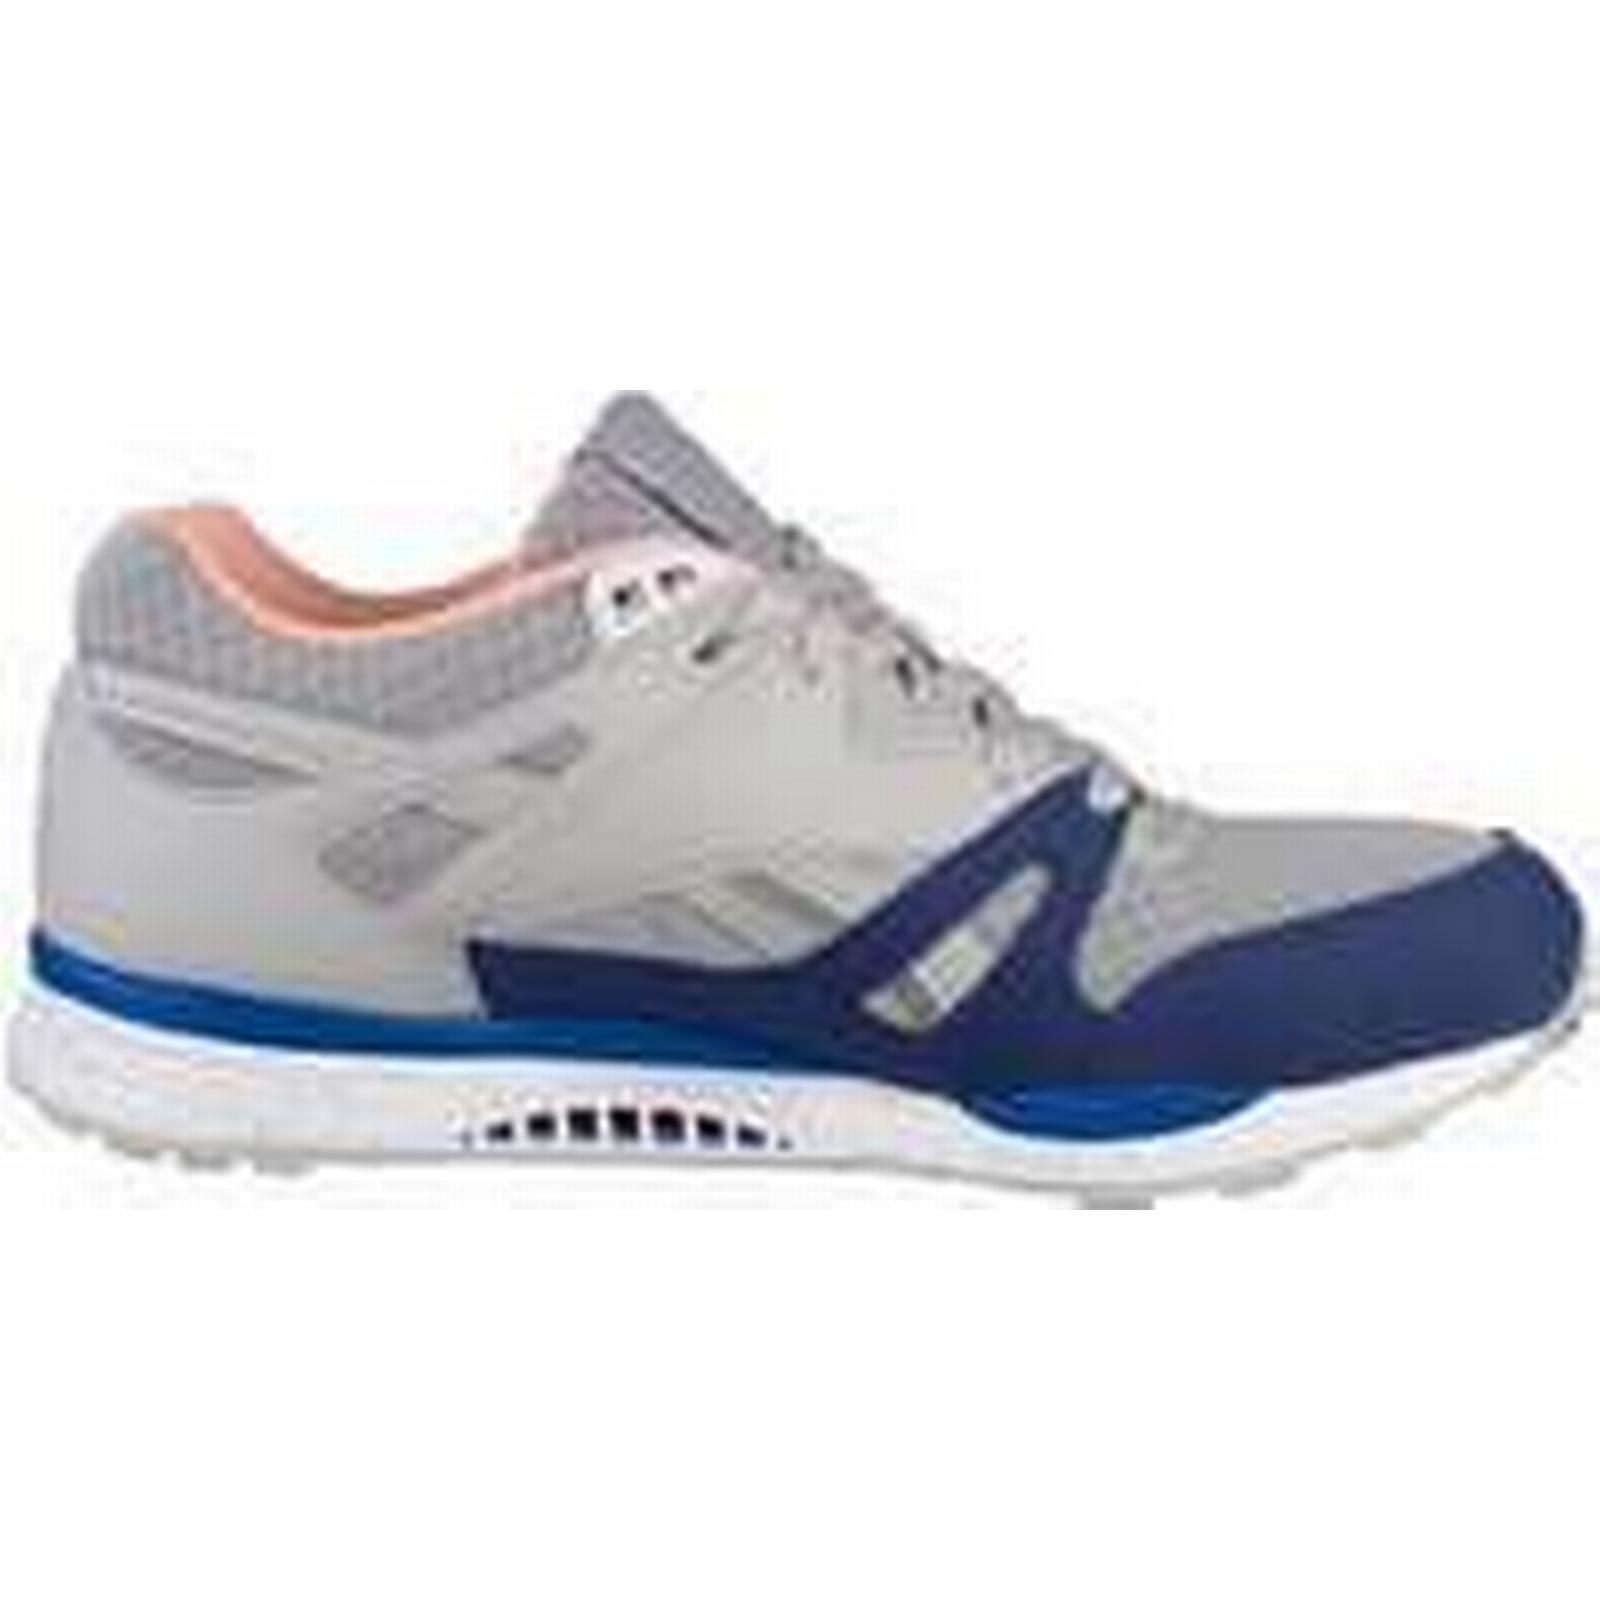 Spartoo.co.uk Reebok Sport Ventilator Clshx Blue men's Shoes (Trainers) in Blue Clshx 446d0f